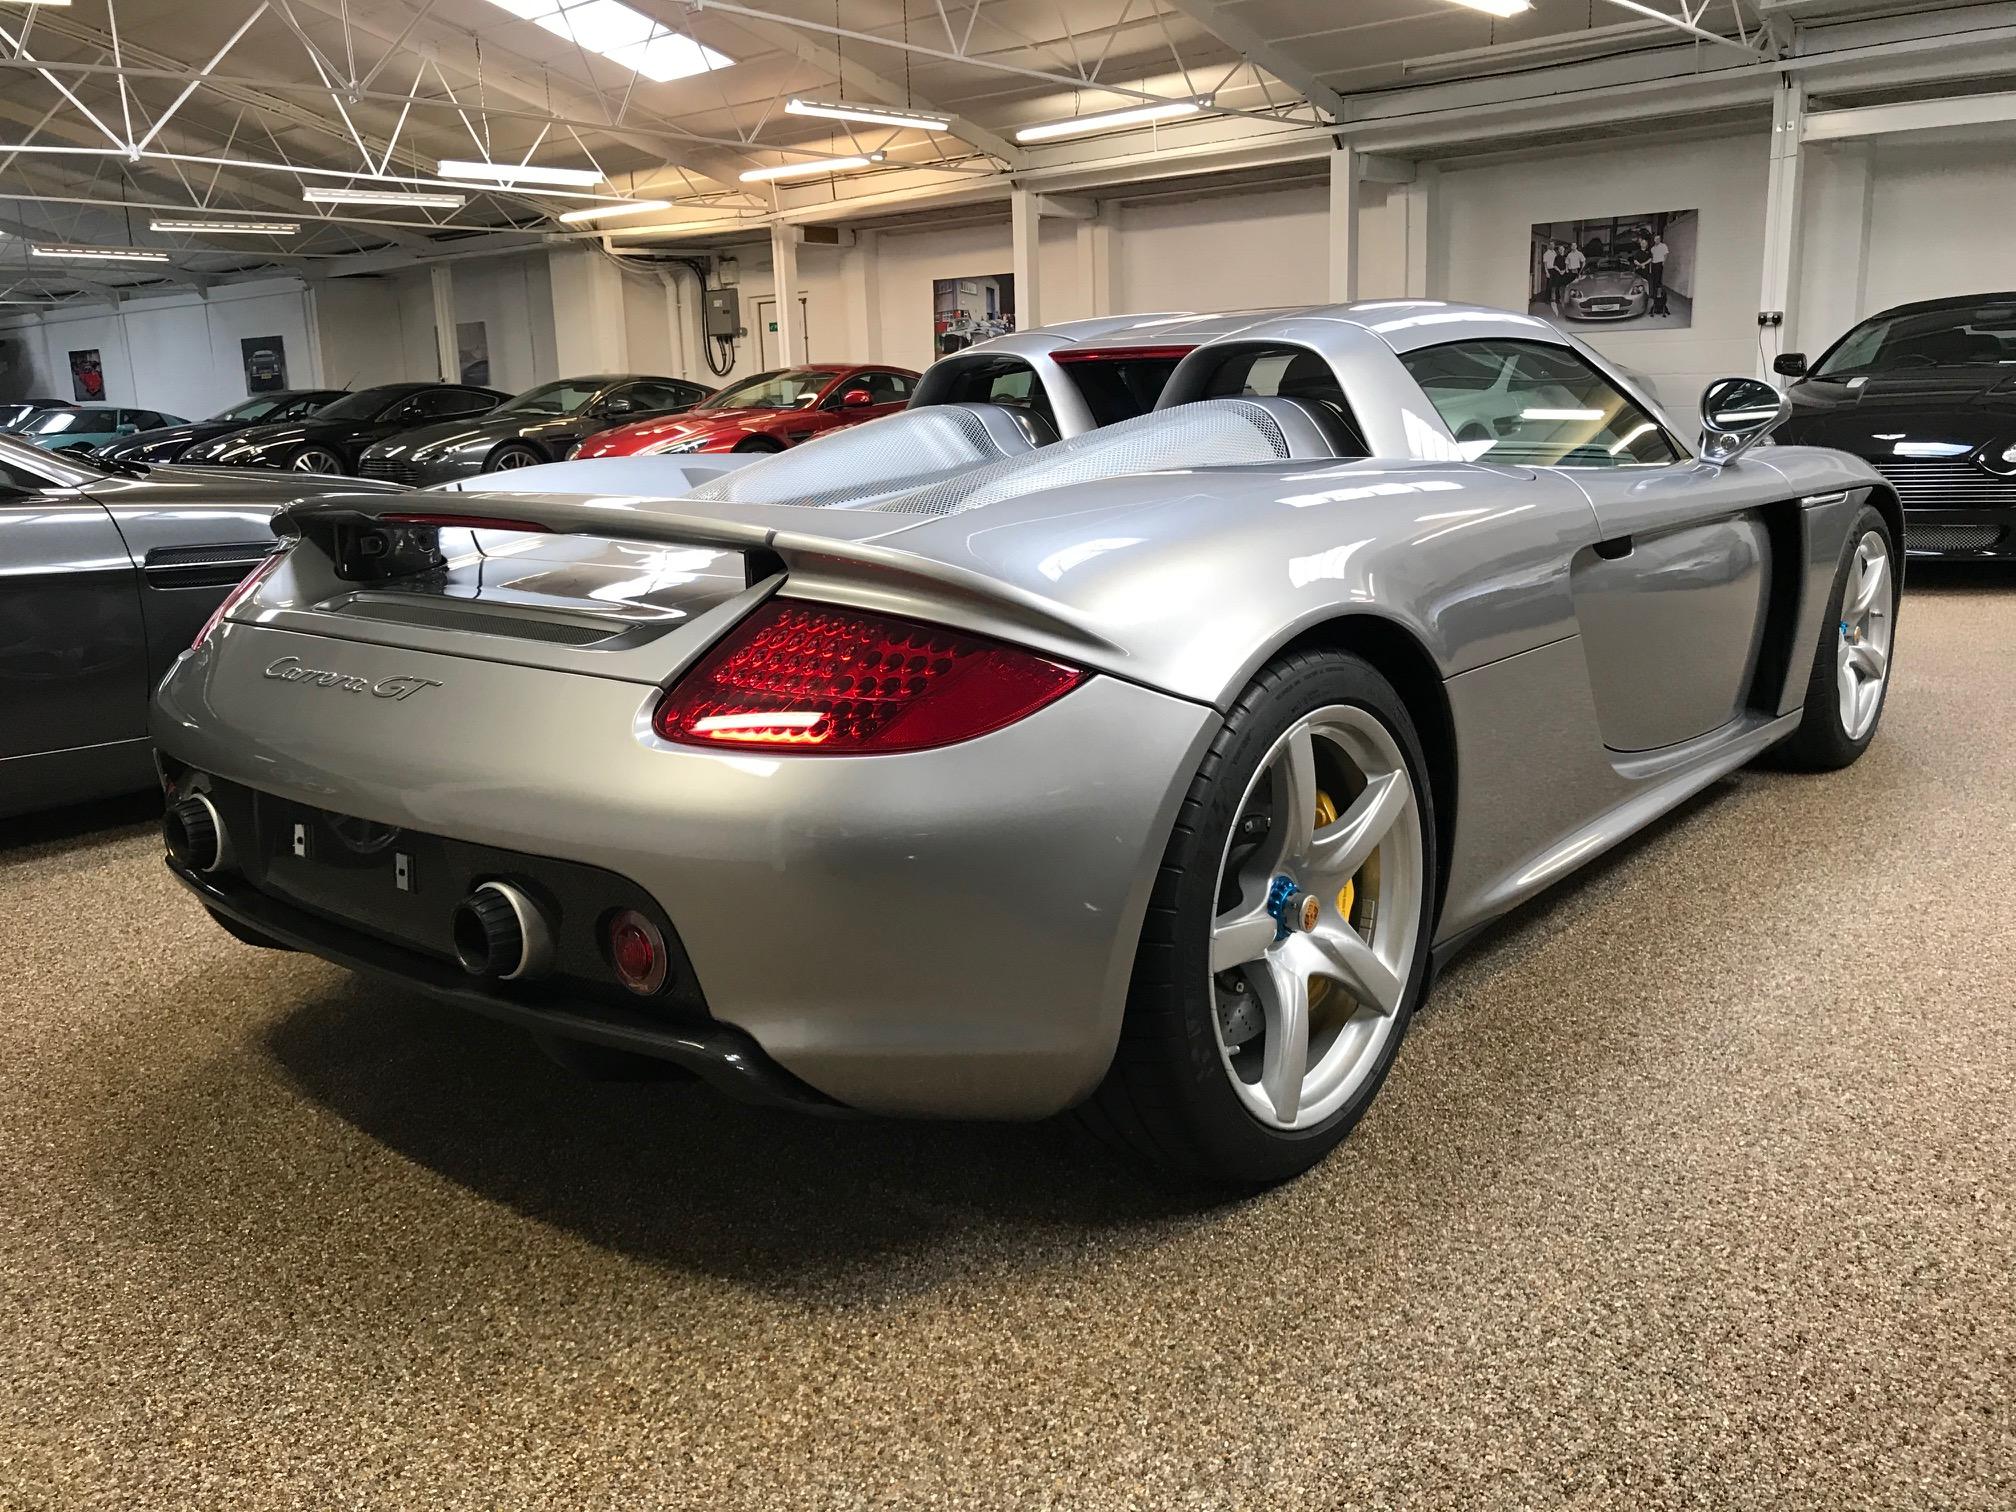 Porsche Carrera GT for sale